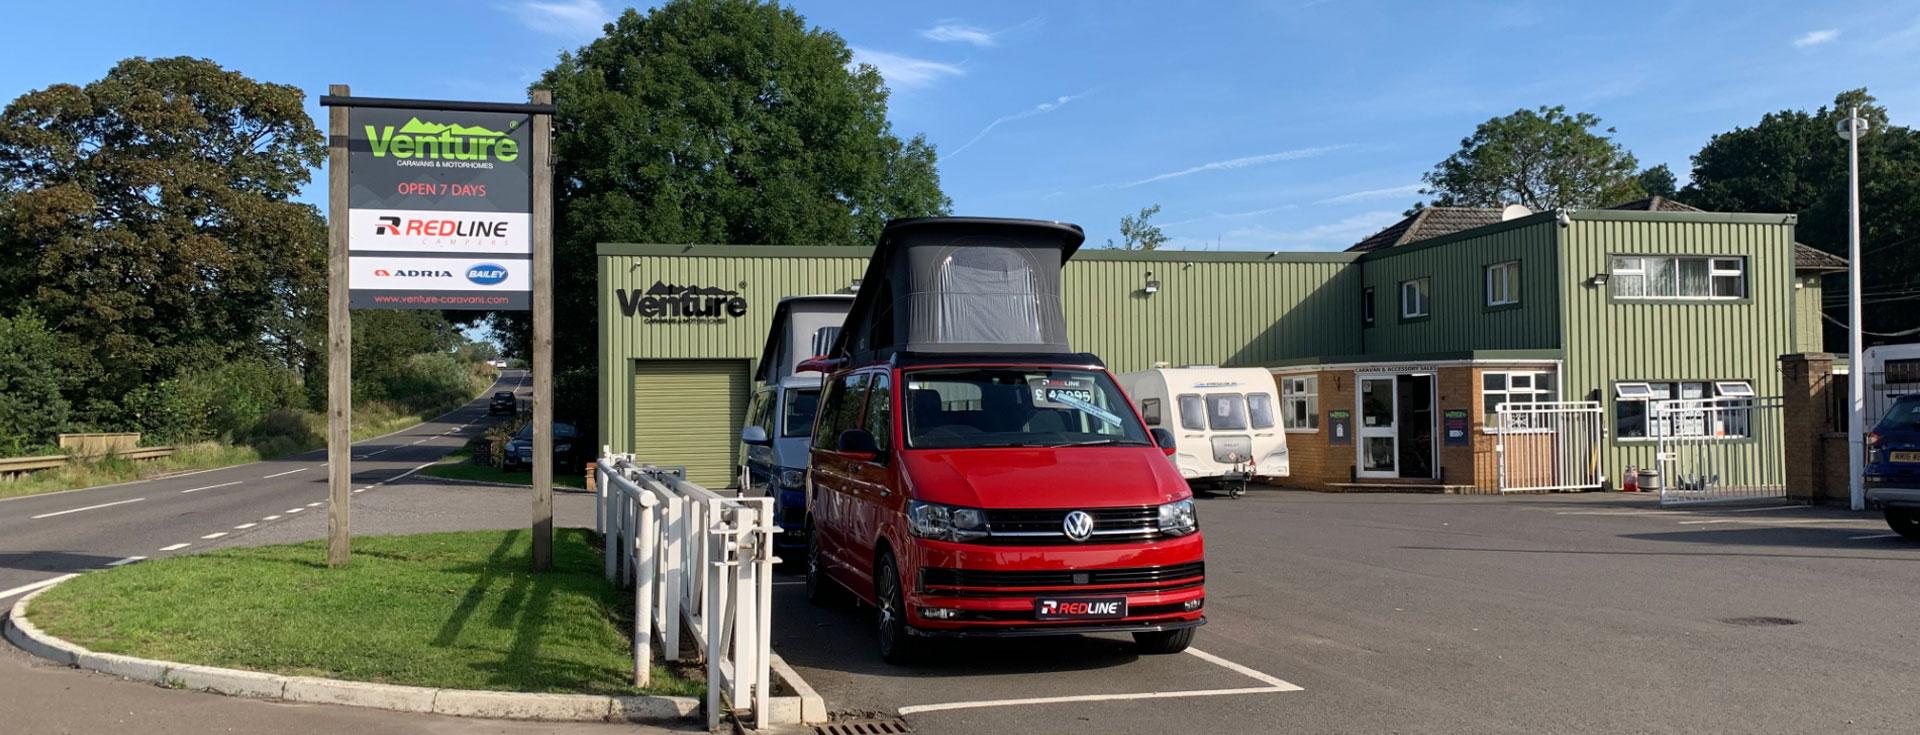 Venture Caravans Daventry